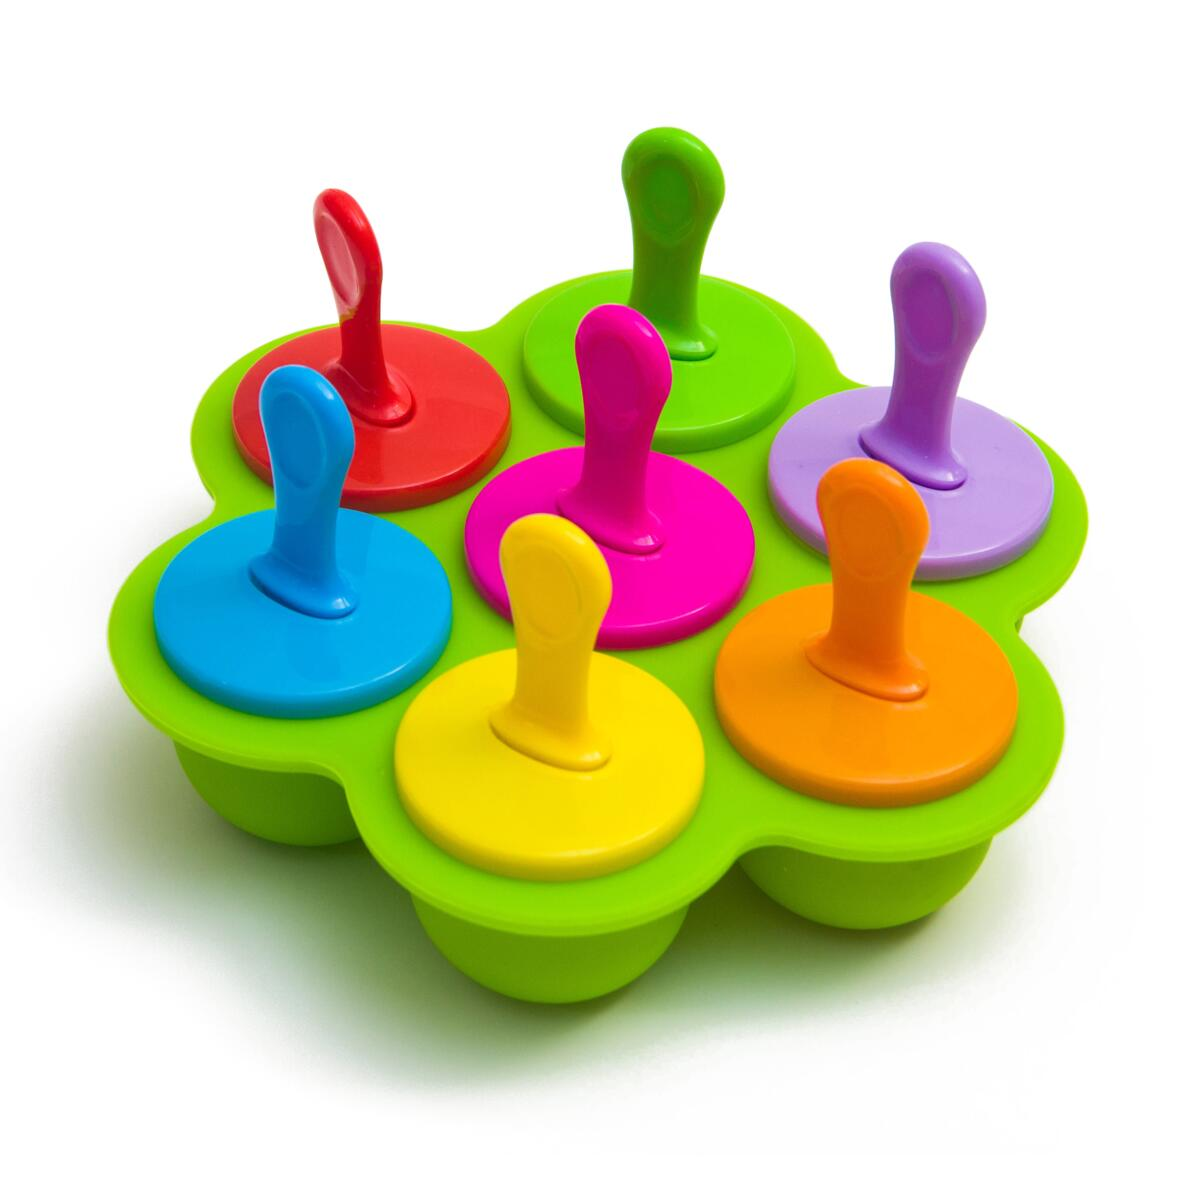 Eparé Toddler Popsicle Molds